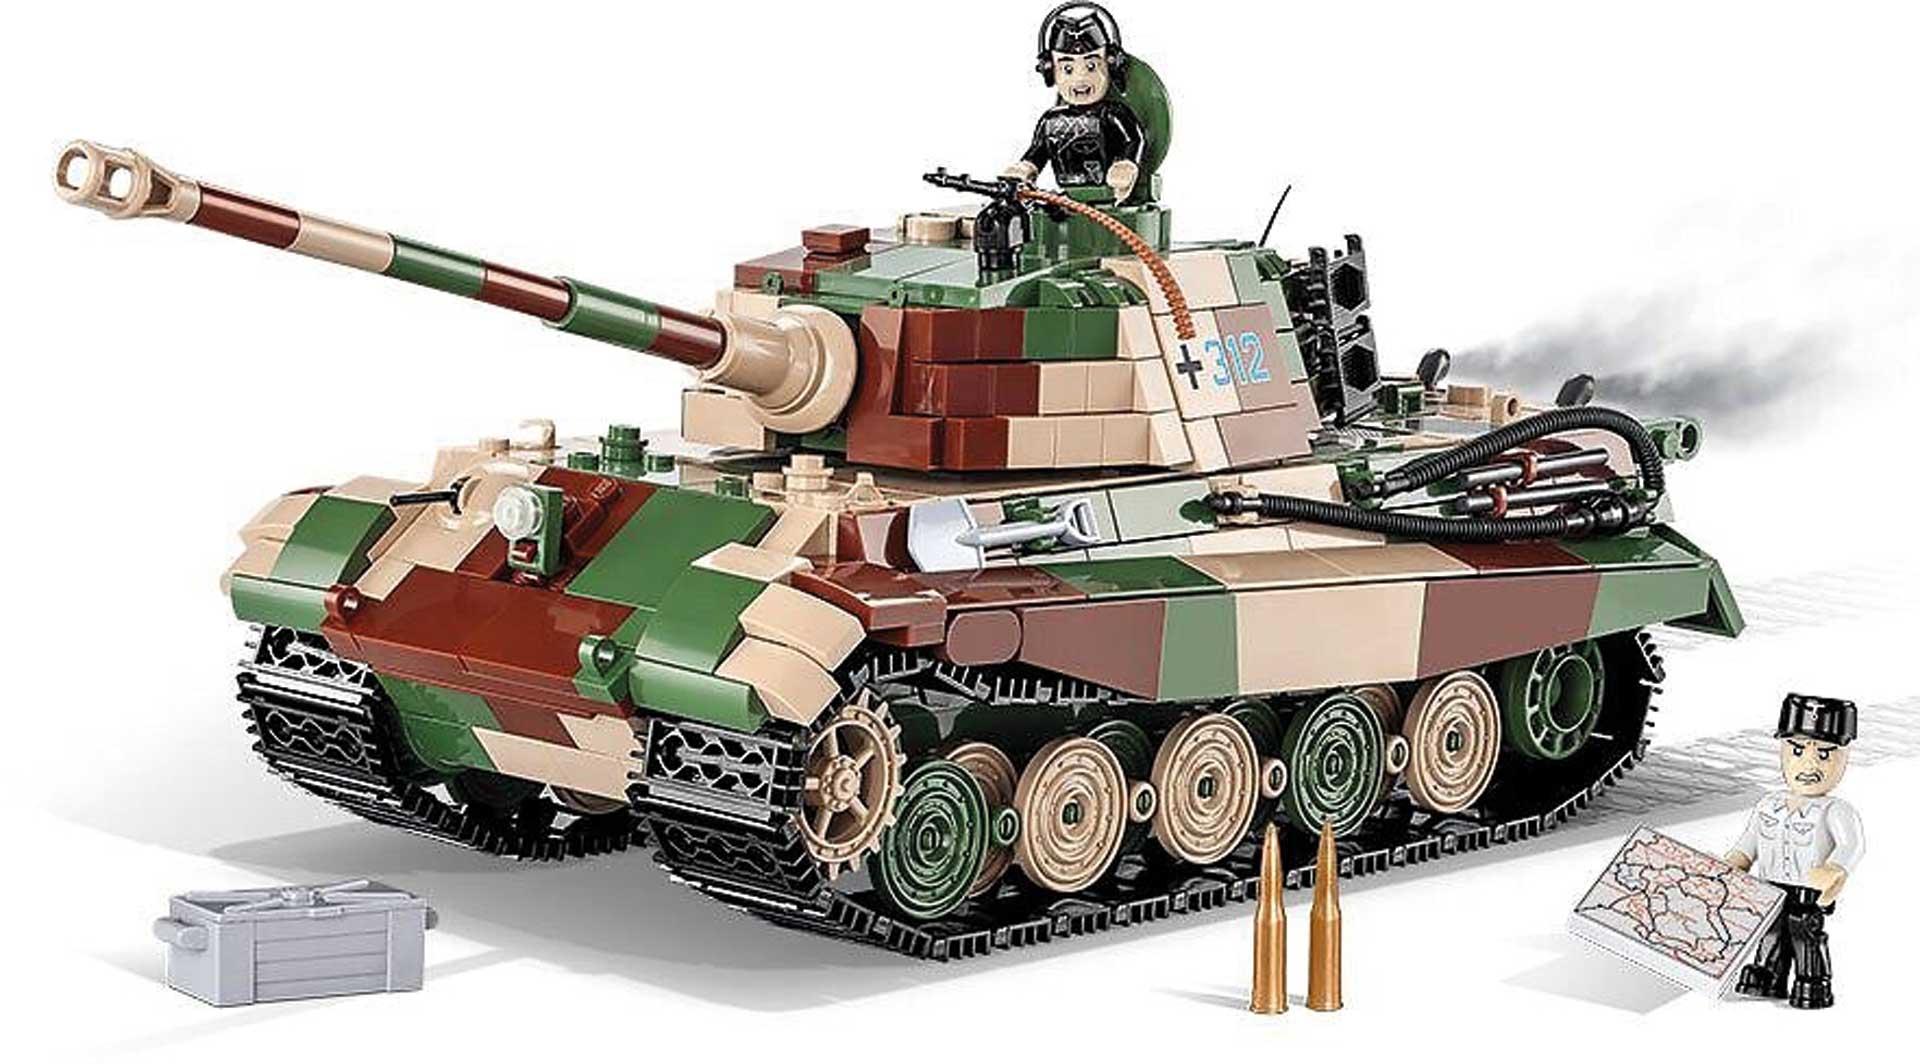 COBI Panzerkampfwagen VI Ausf. B Königstiger 1000 Teile Klemmbausteine